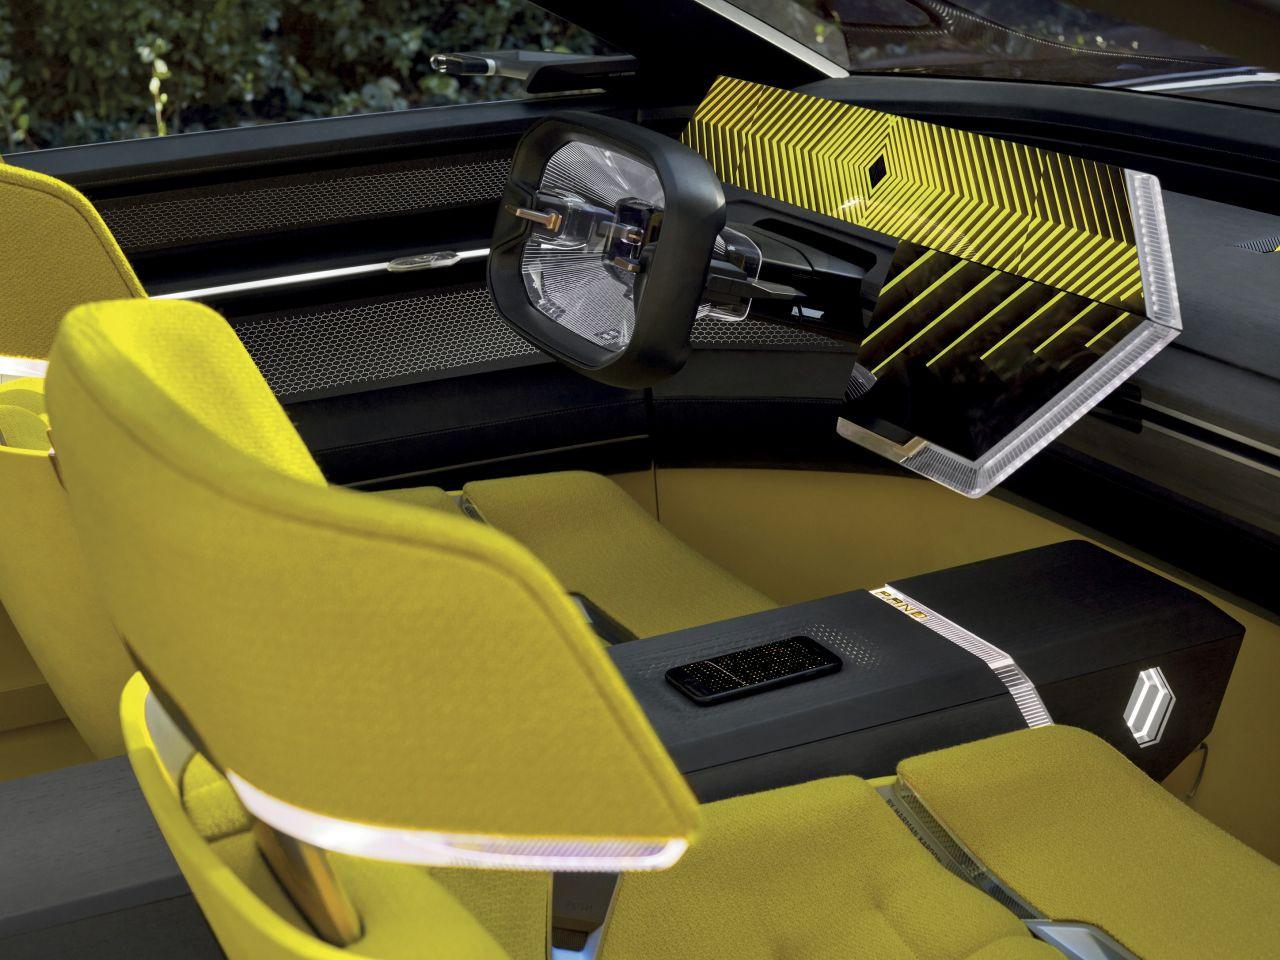 Böyle otomobil mi olur? İşte Renault MORPHOZ - Page 2